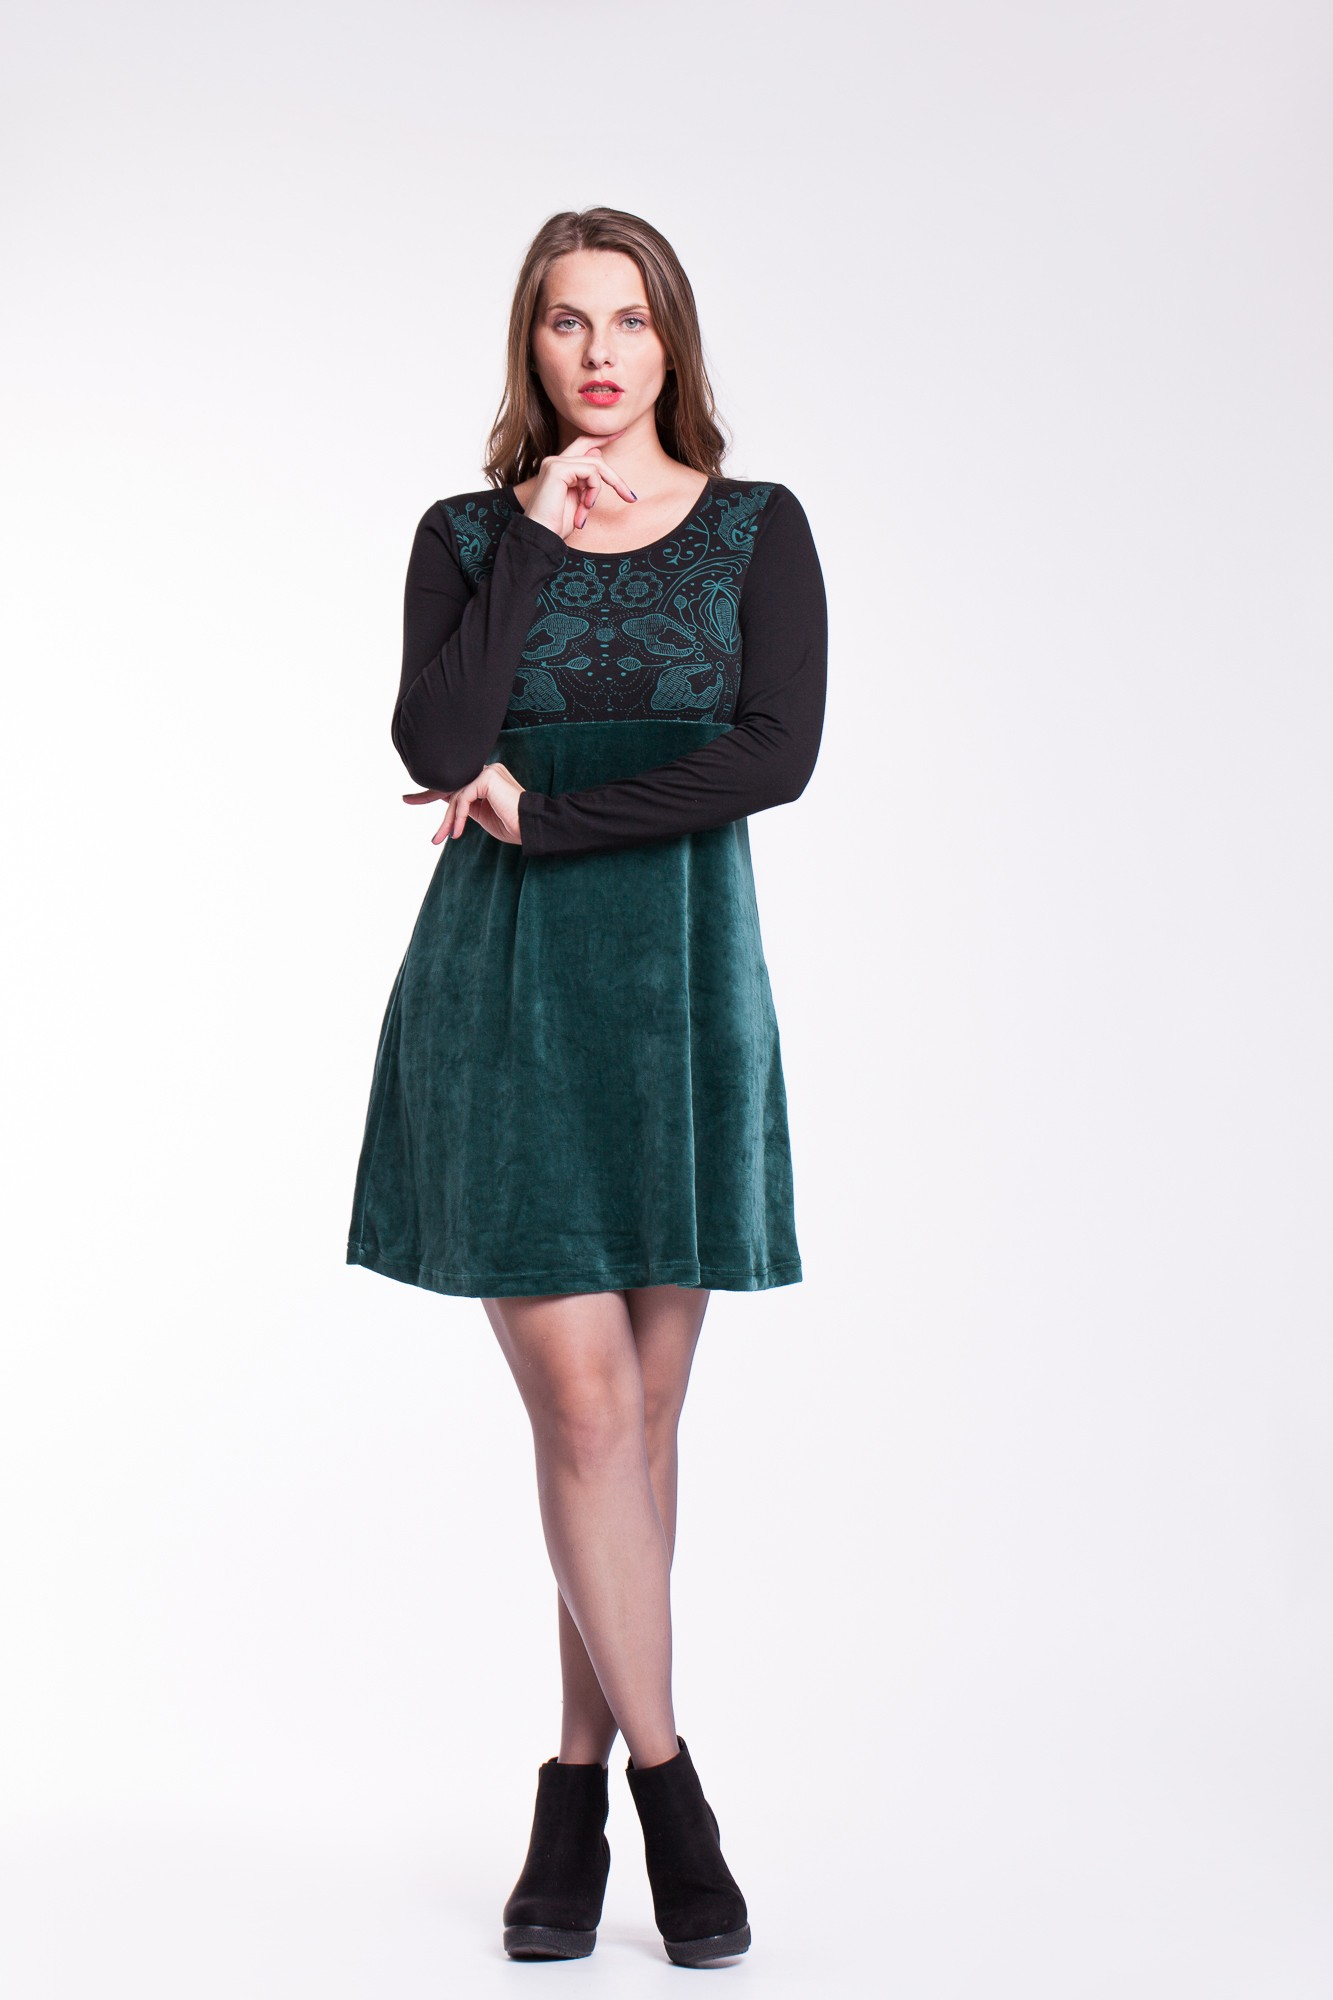 Rochie verde catifea Amira imprimata